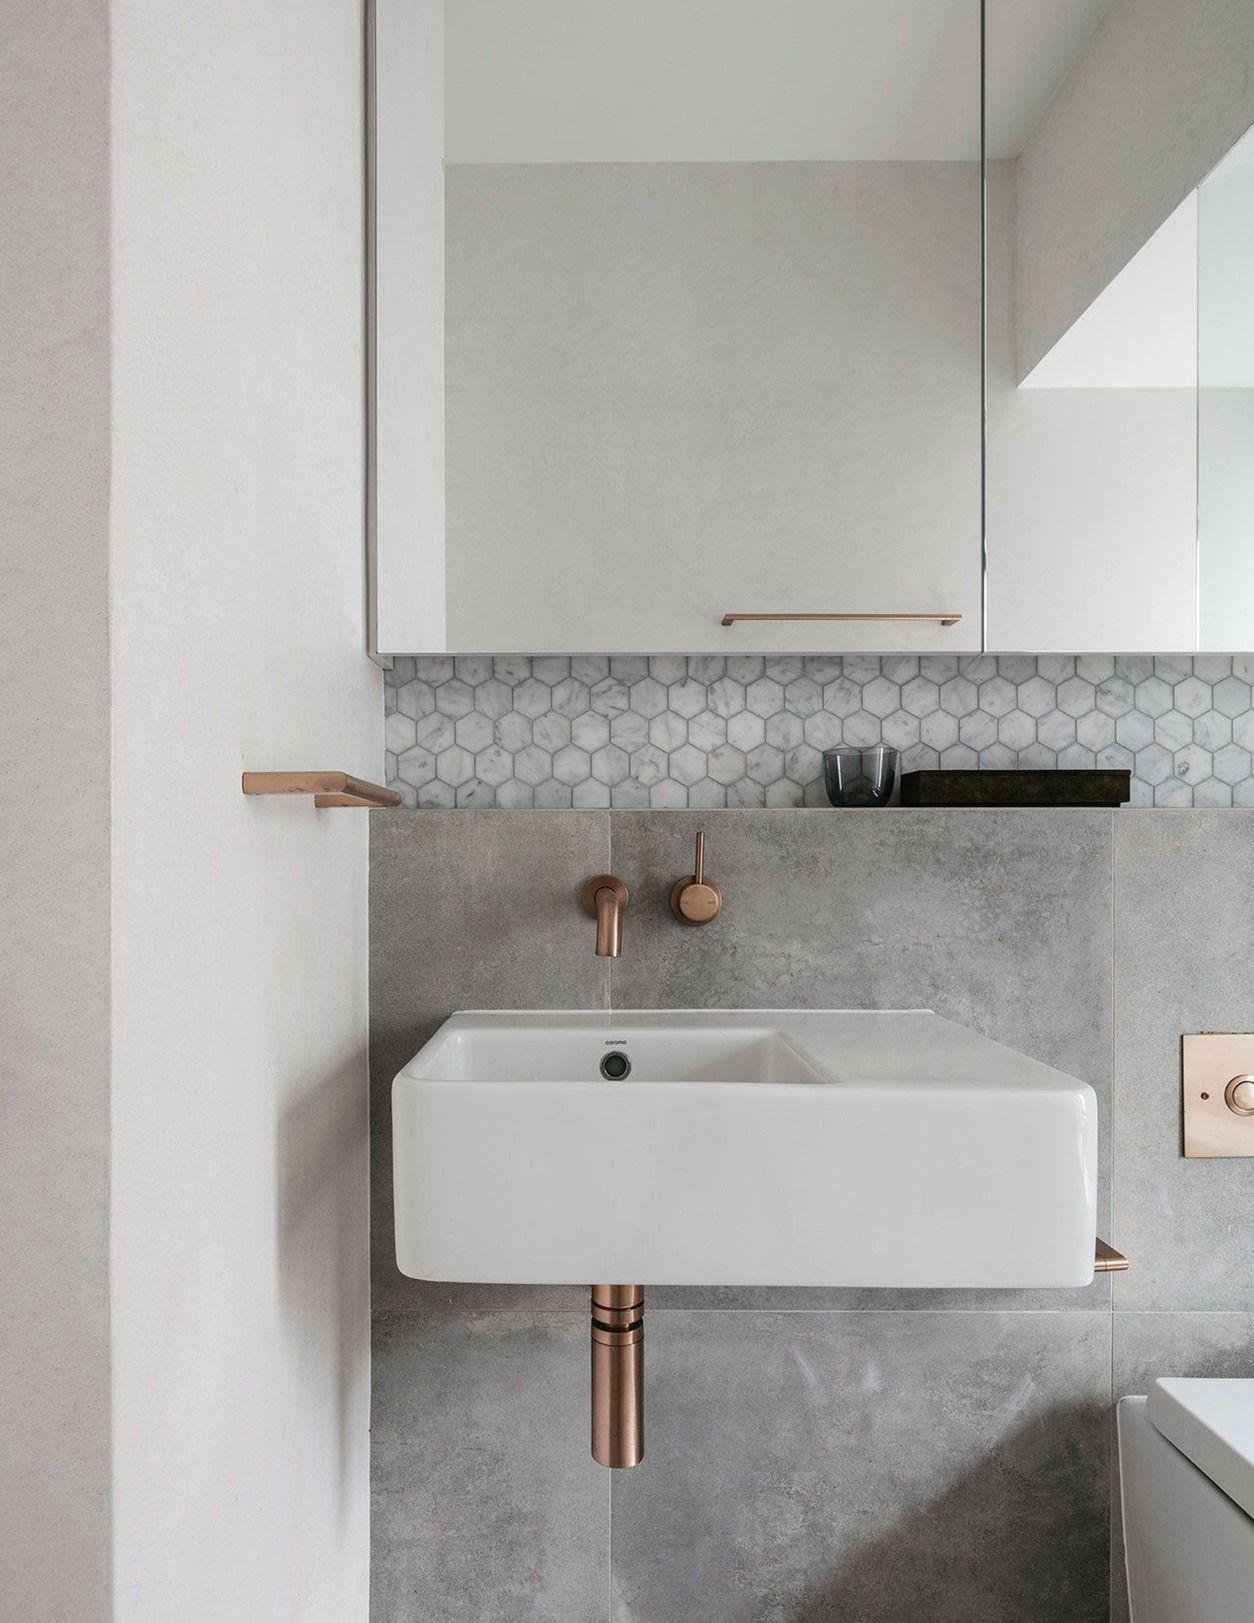 Remodeling Bathroom Design Free Bathroomdesignfree